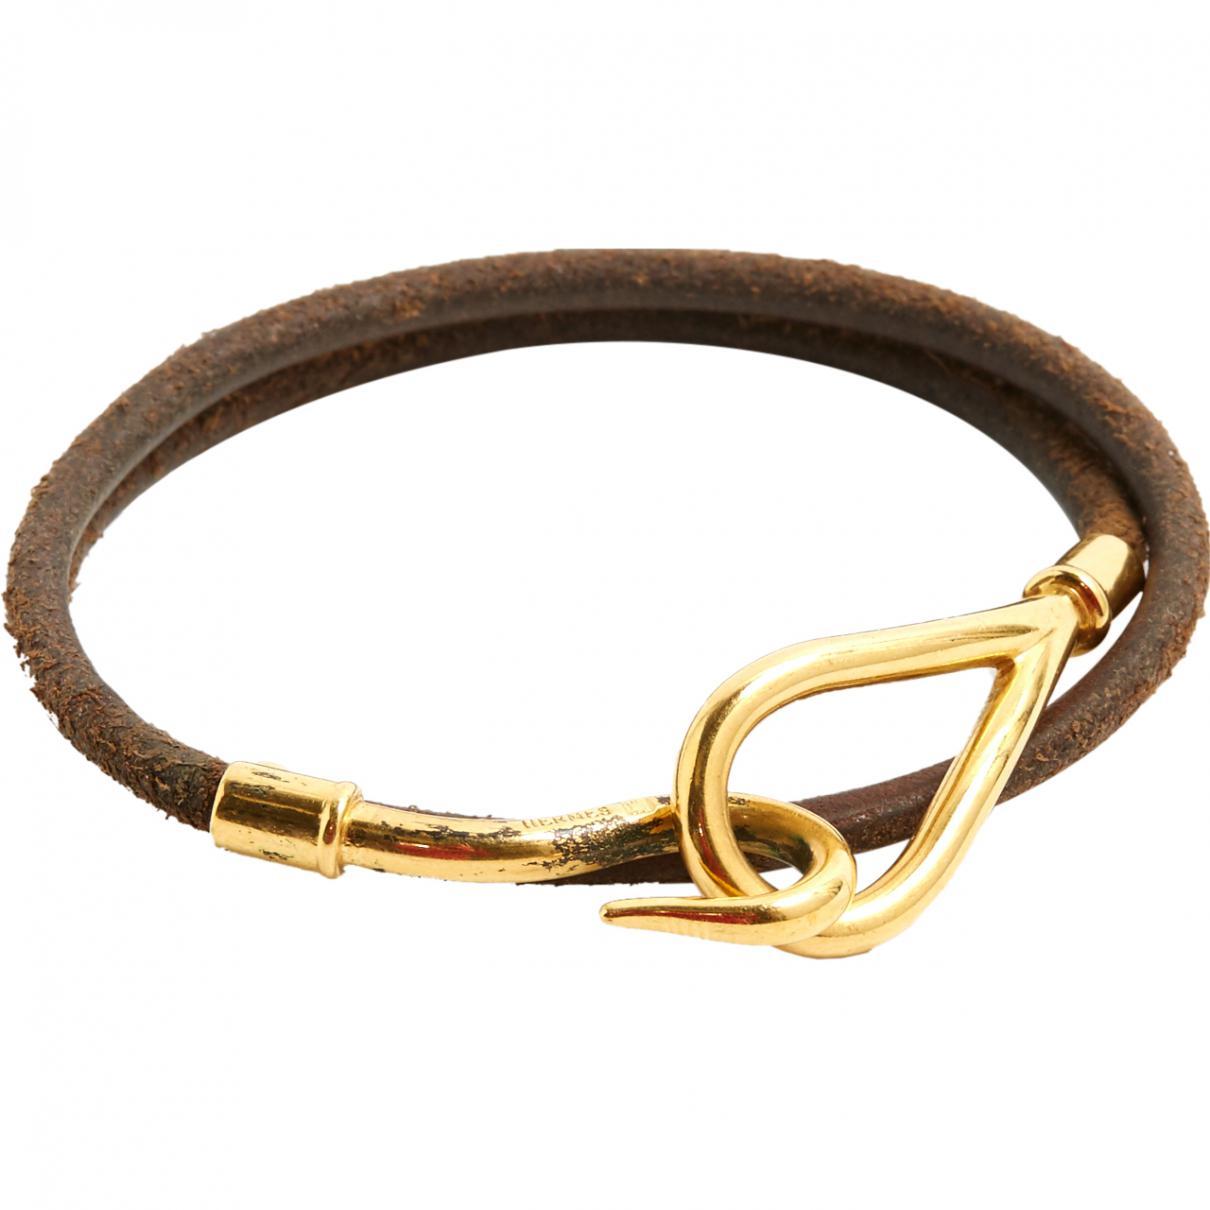 10a1bf8bc34c Lyst - Bracelet Jumbo en cuir Hermès en coloris Marron